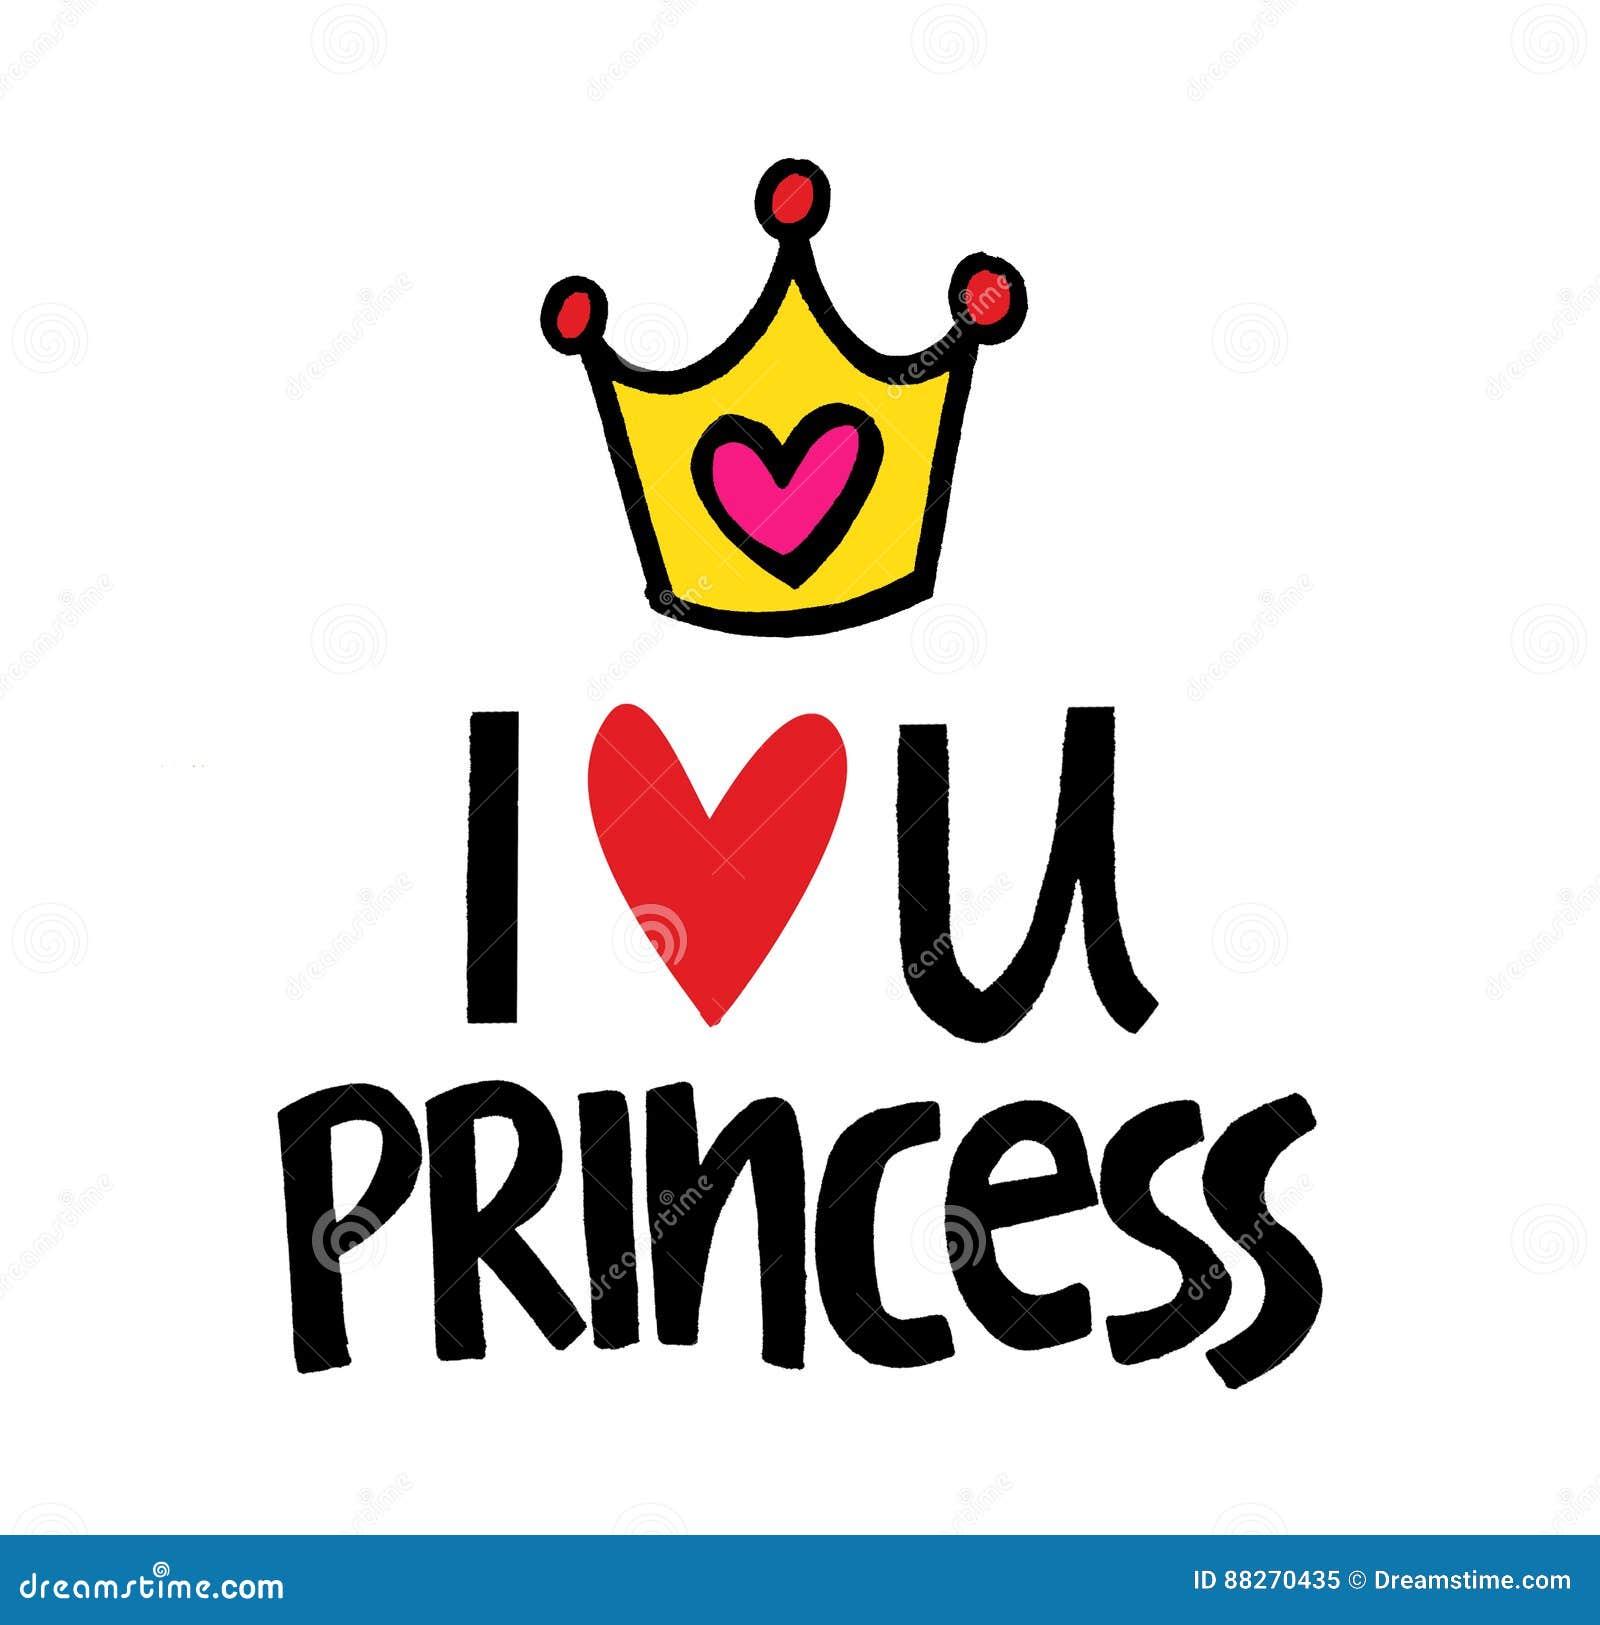 i love you my dear princess